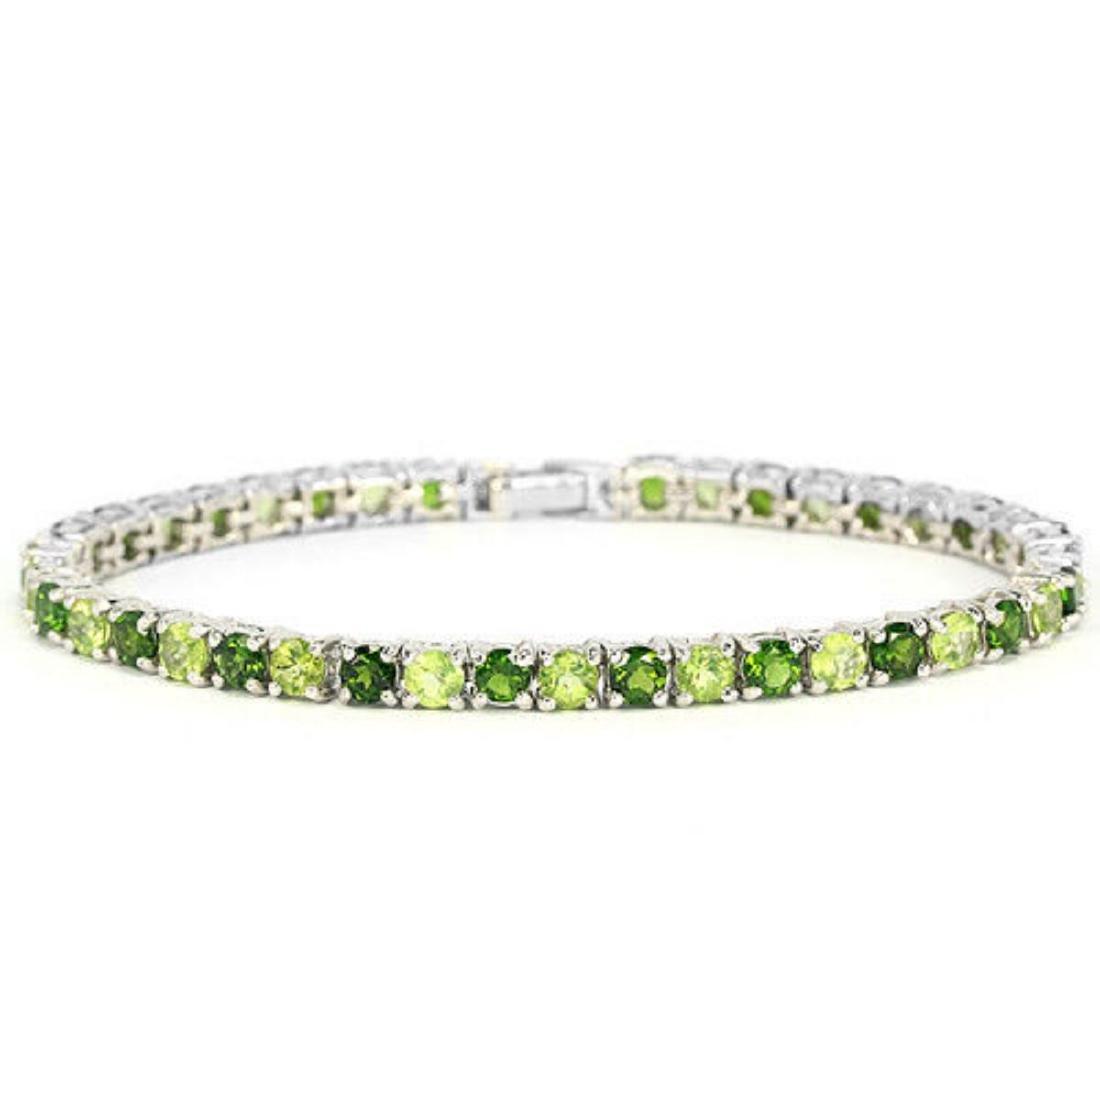 NATURAL GREEN CHROME DIOPSIDE & PERIDOT Bracelet